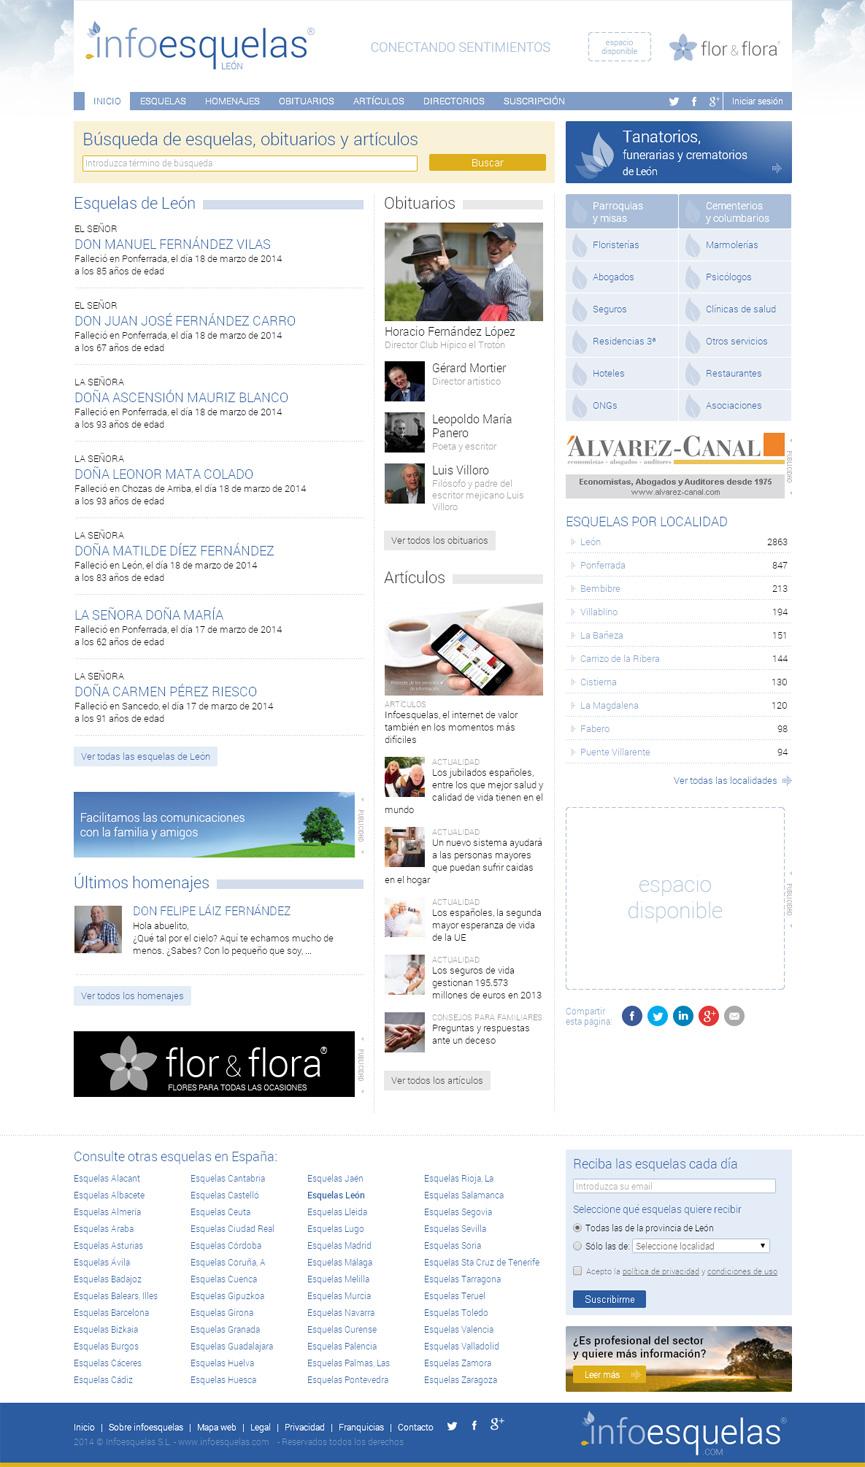 Infoesquelas_info1